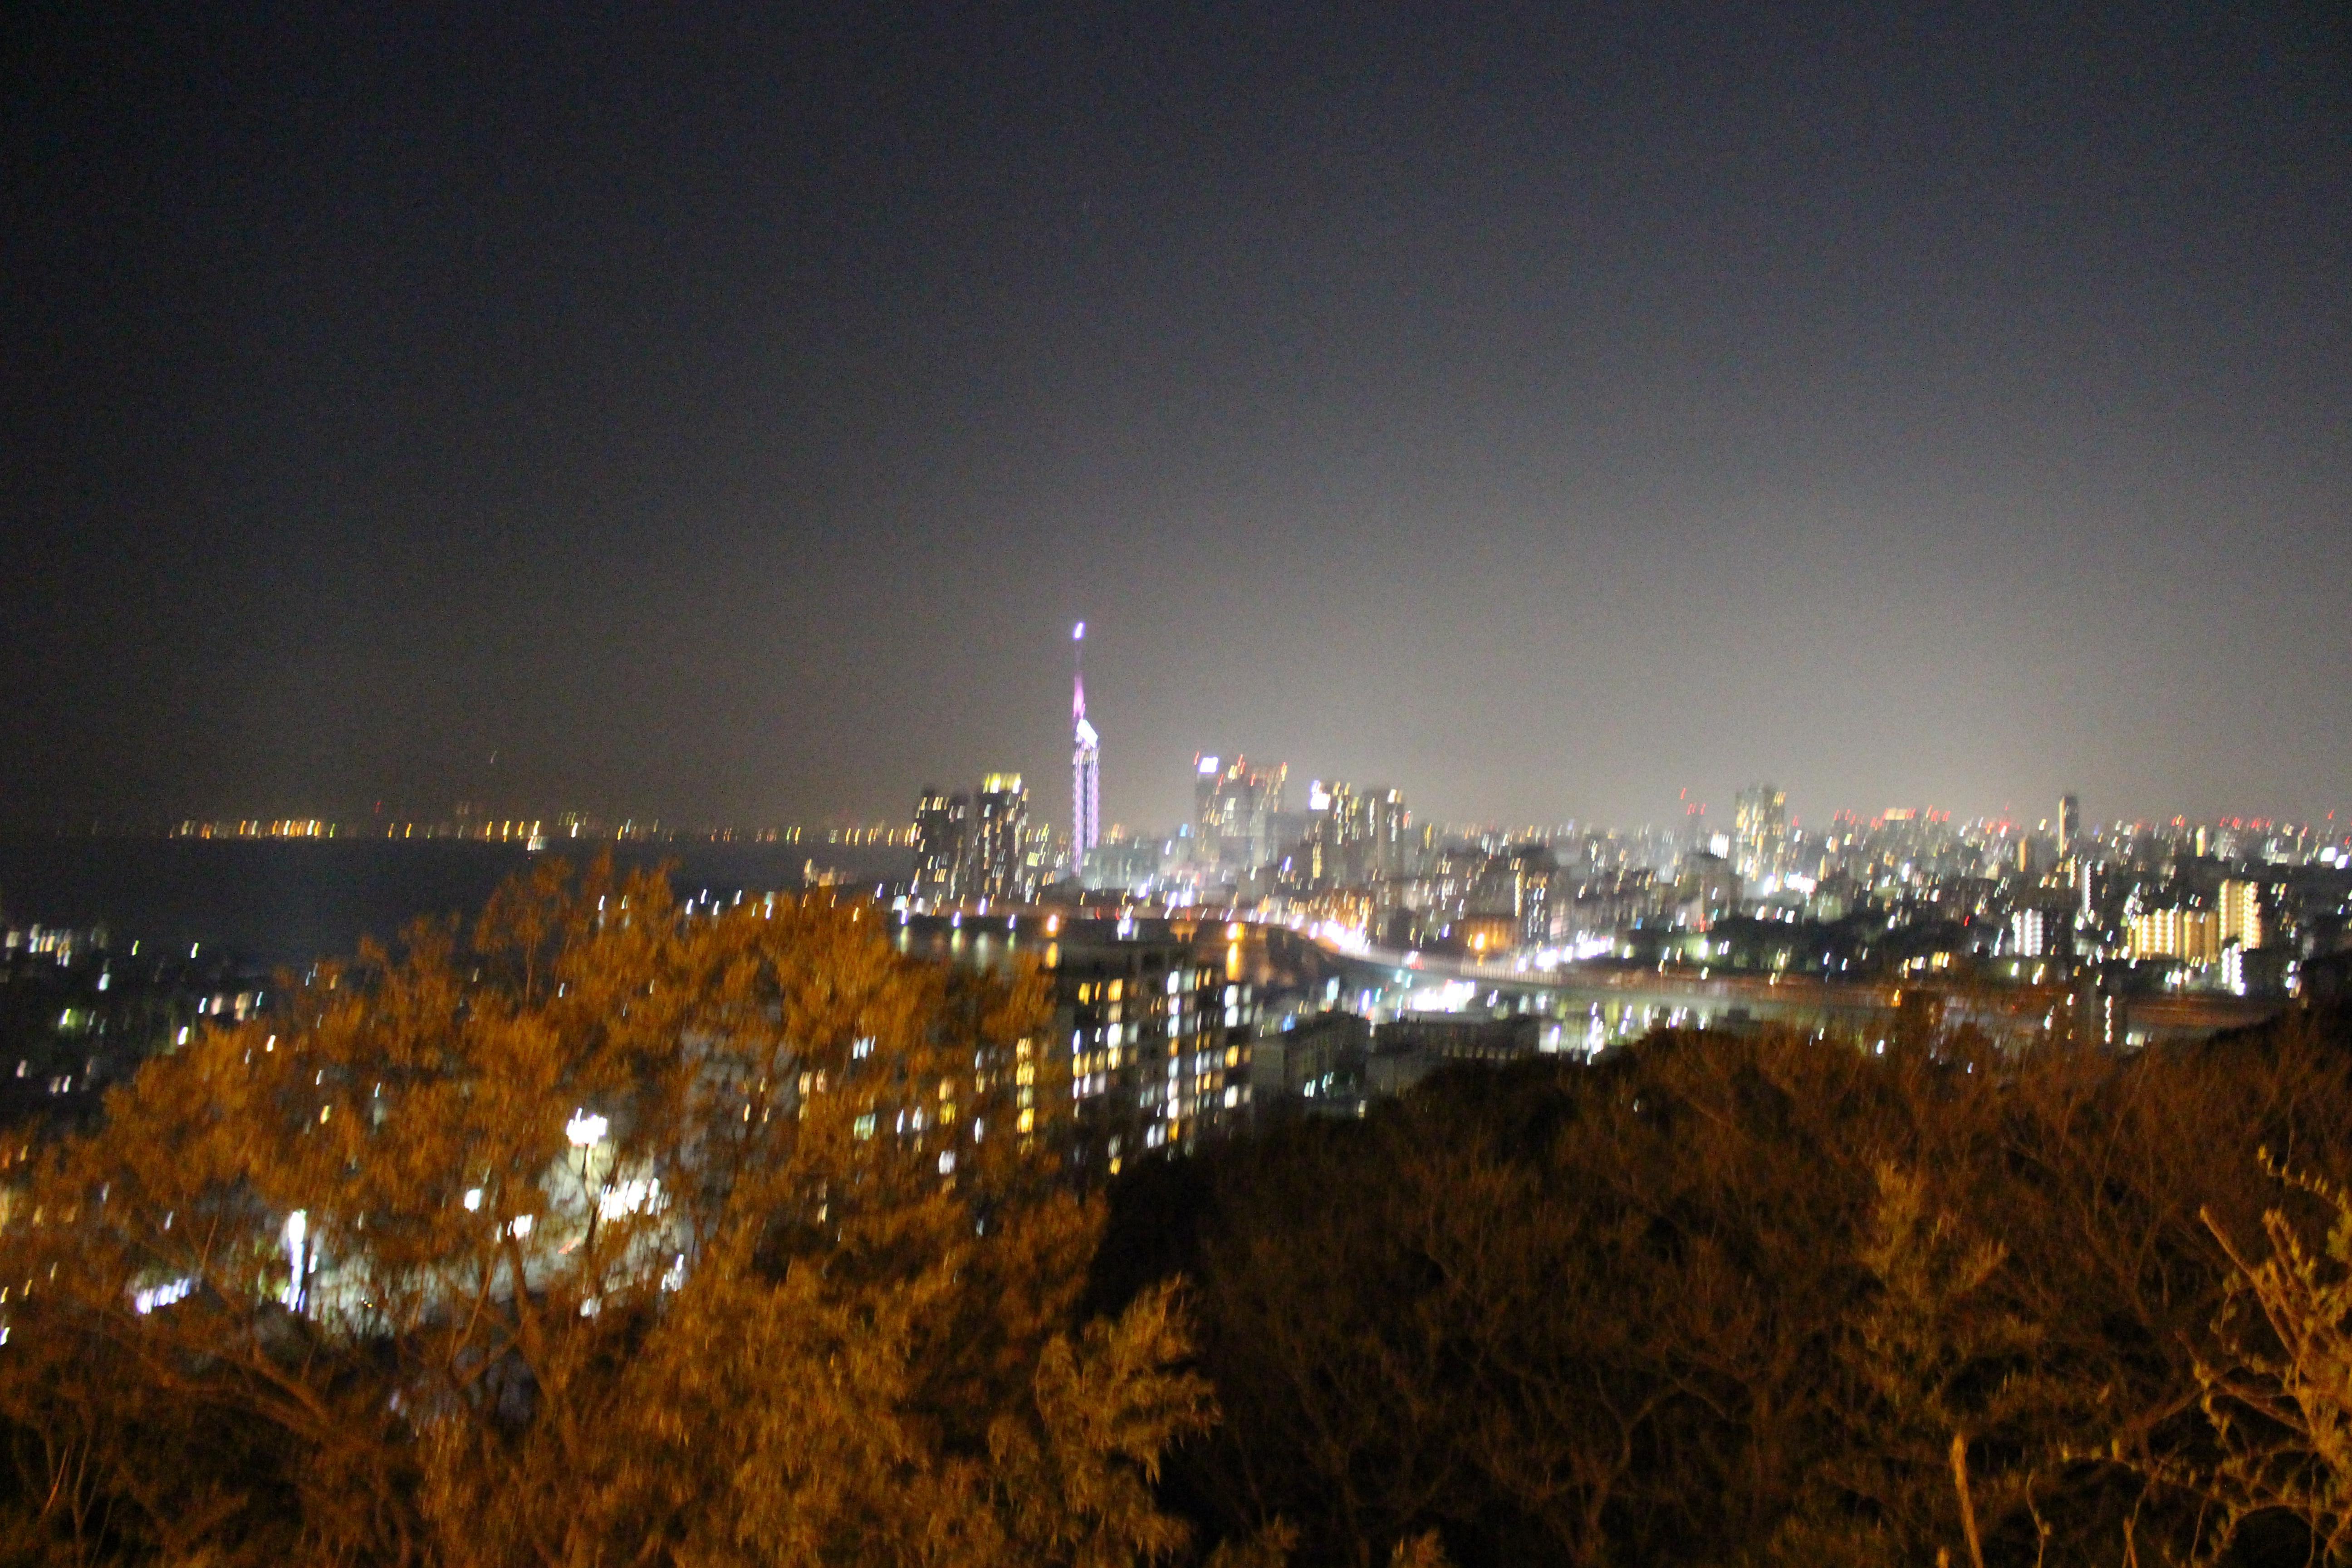 鷲尾愛宕神社の周辺